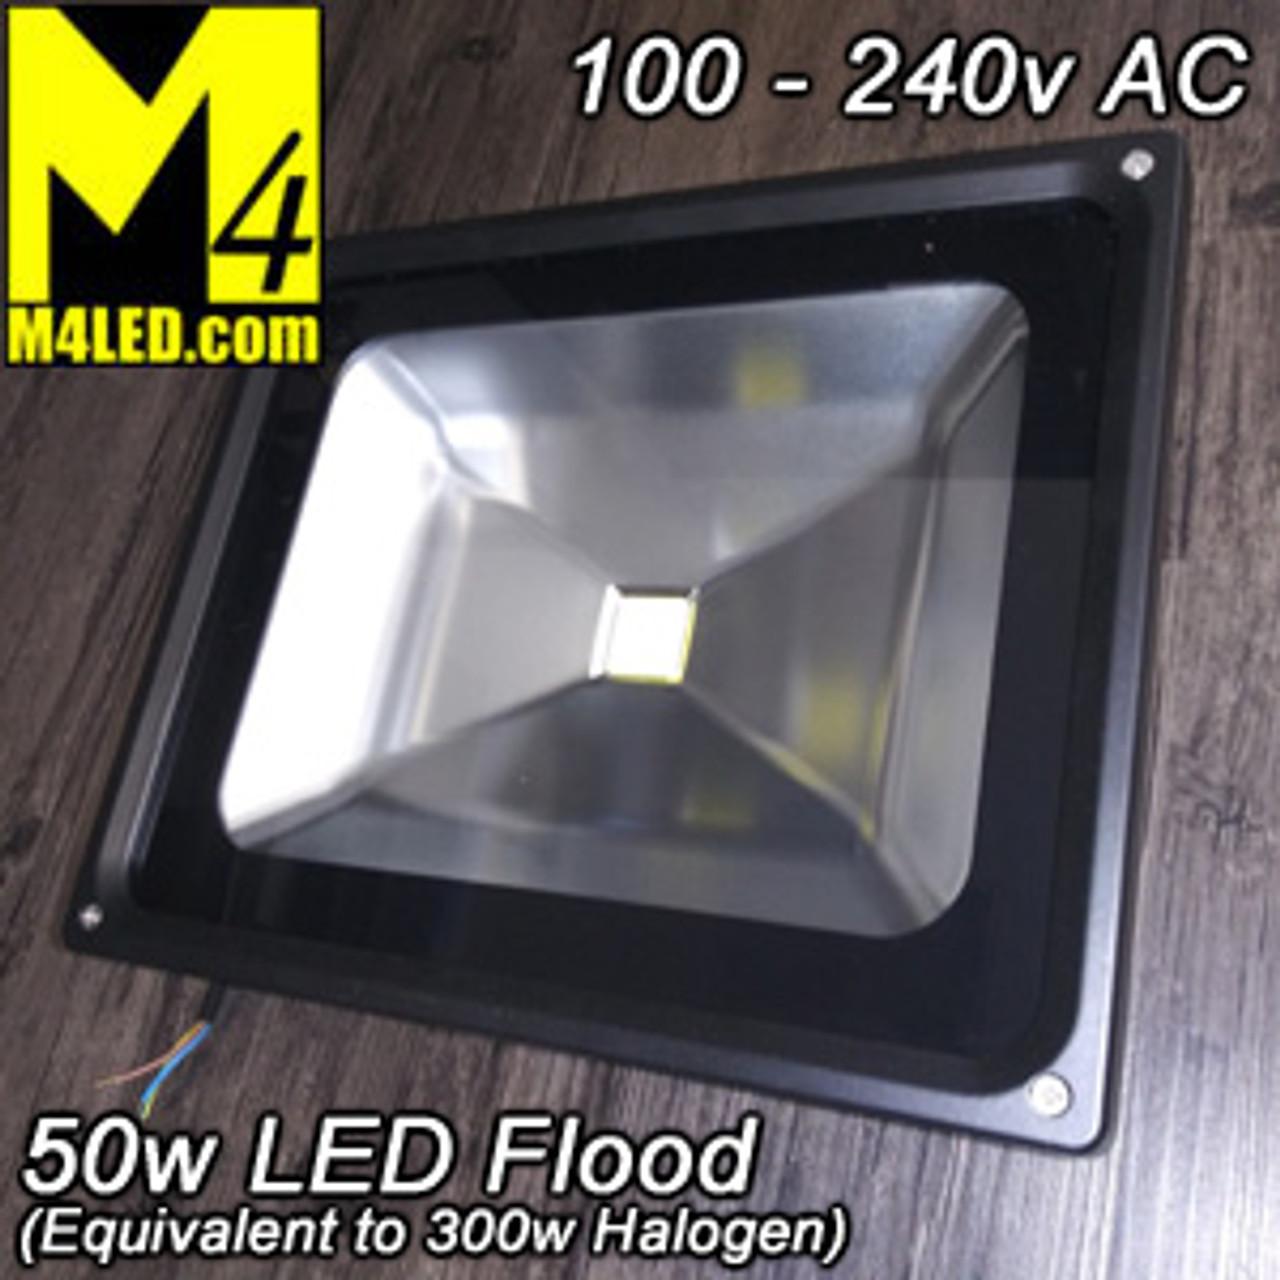 UT-F0501 Large 50w Flood Light (compare to 300w Halogen)